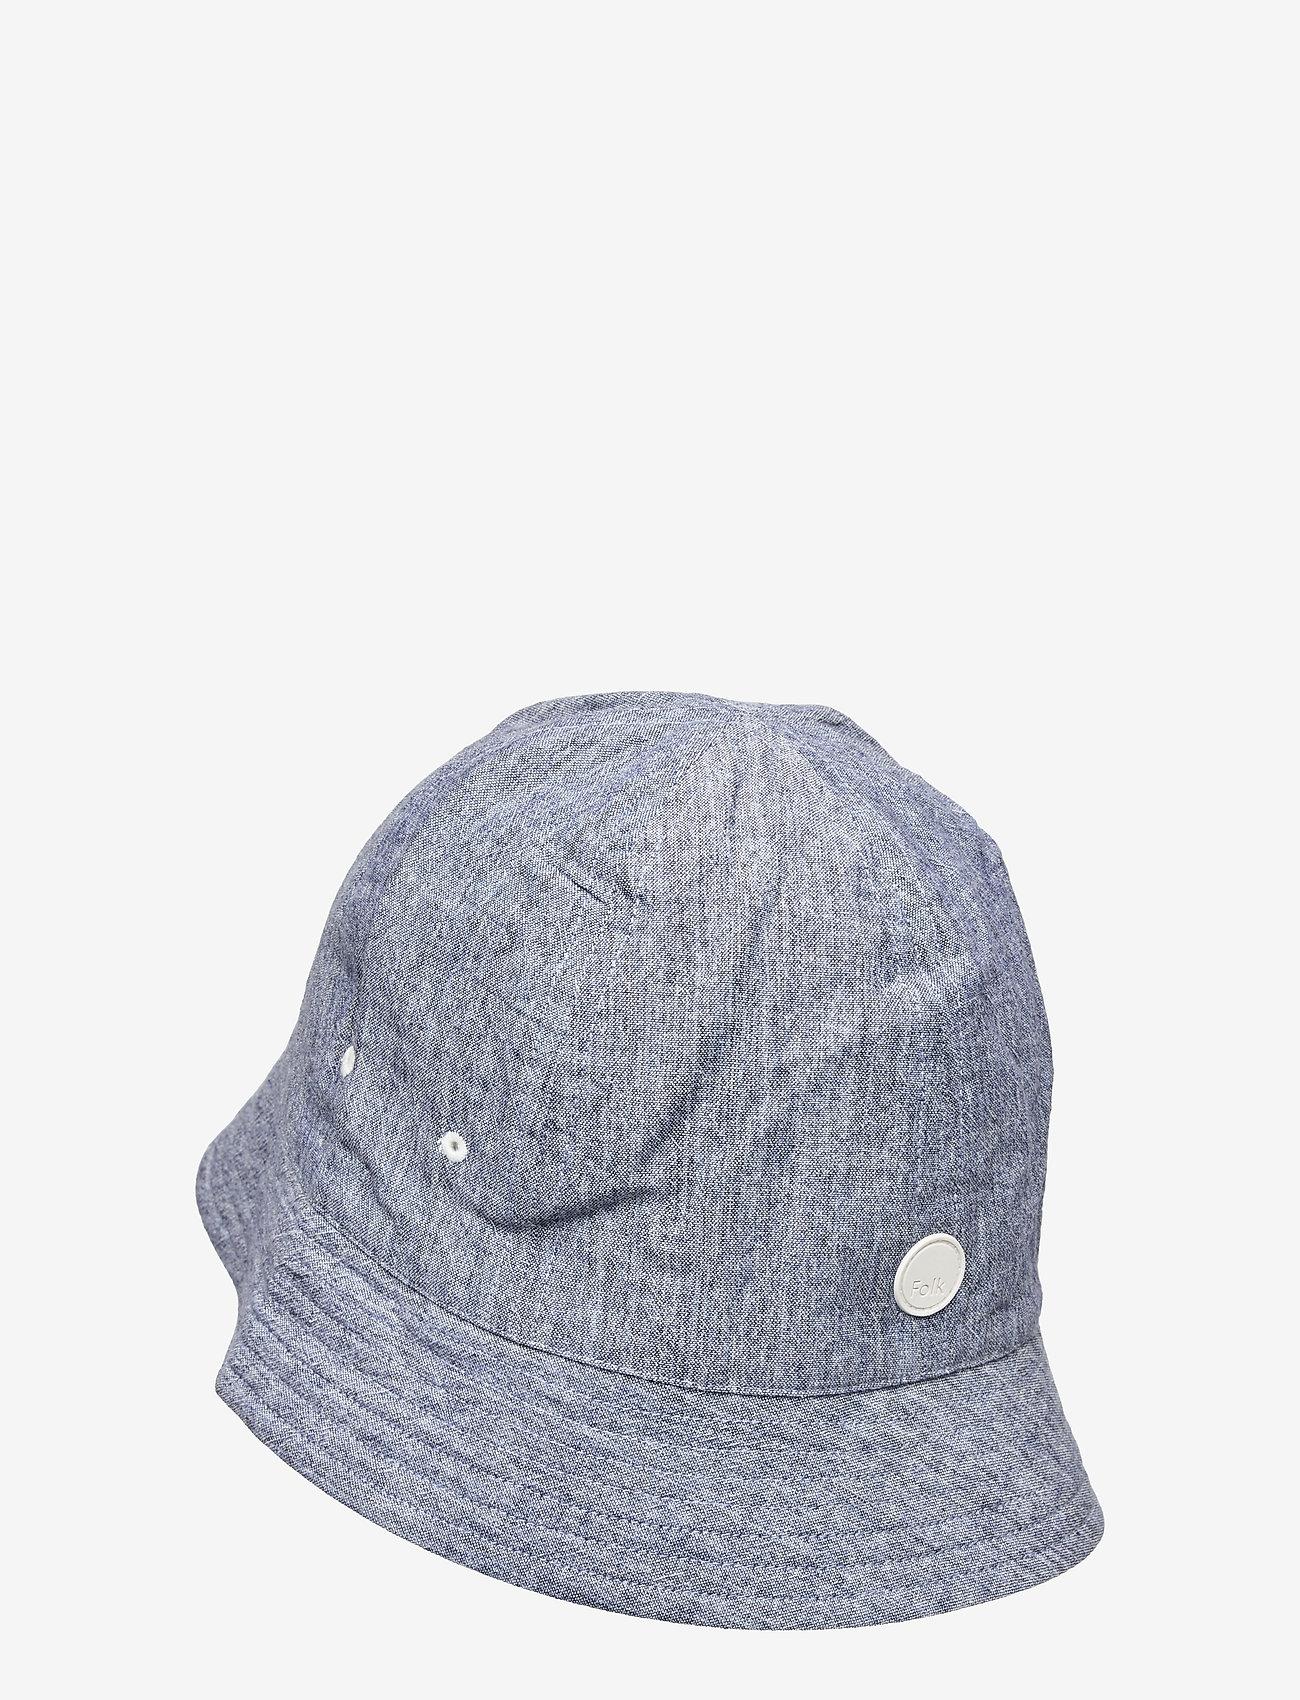 Folk - SEOUL BUCKET HAT - bonnets & casquettes - dusty blue mix - 1